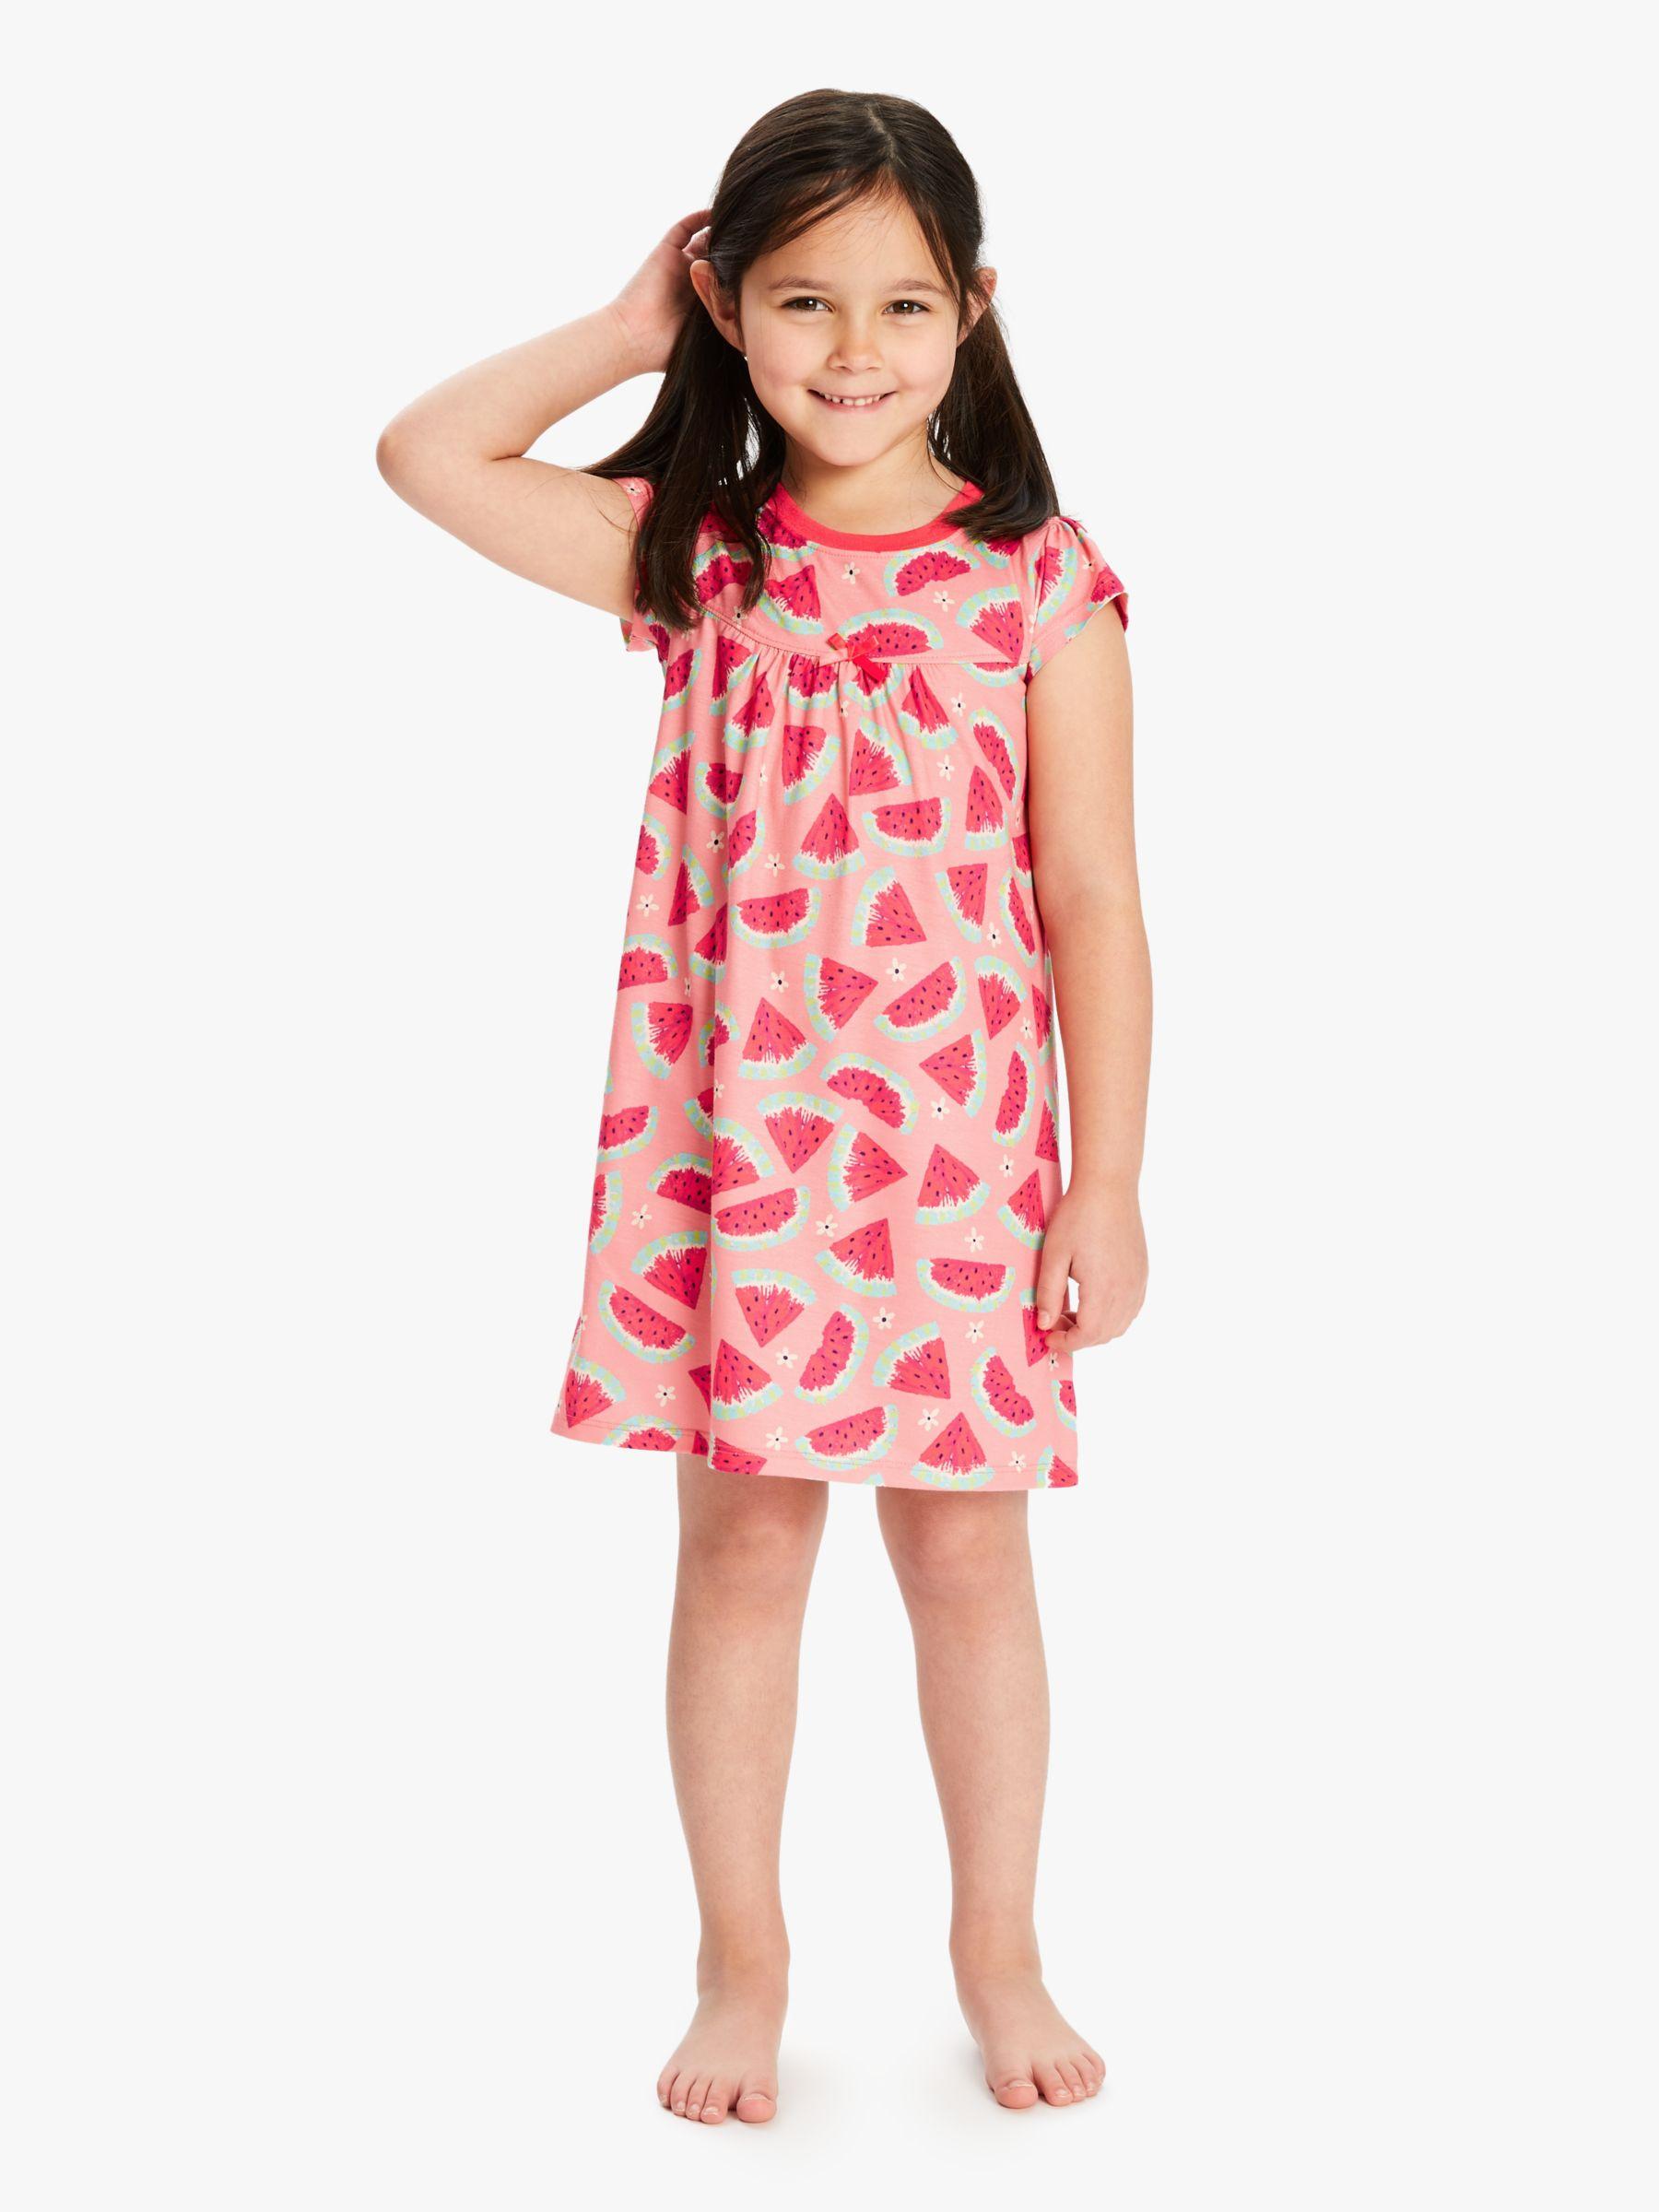 Hatley Hatley Girls' Watermelon Print Night Dress, Pink